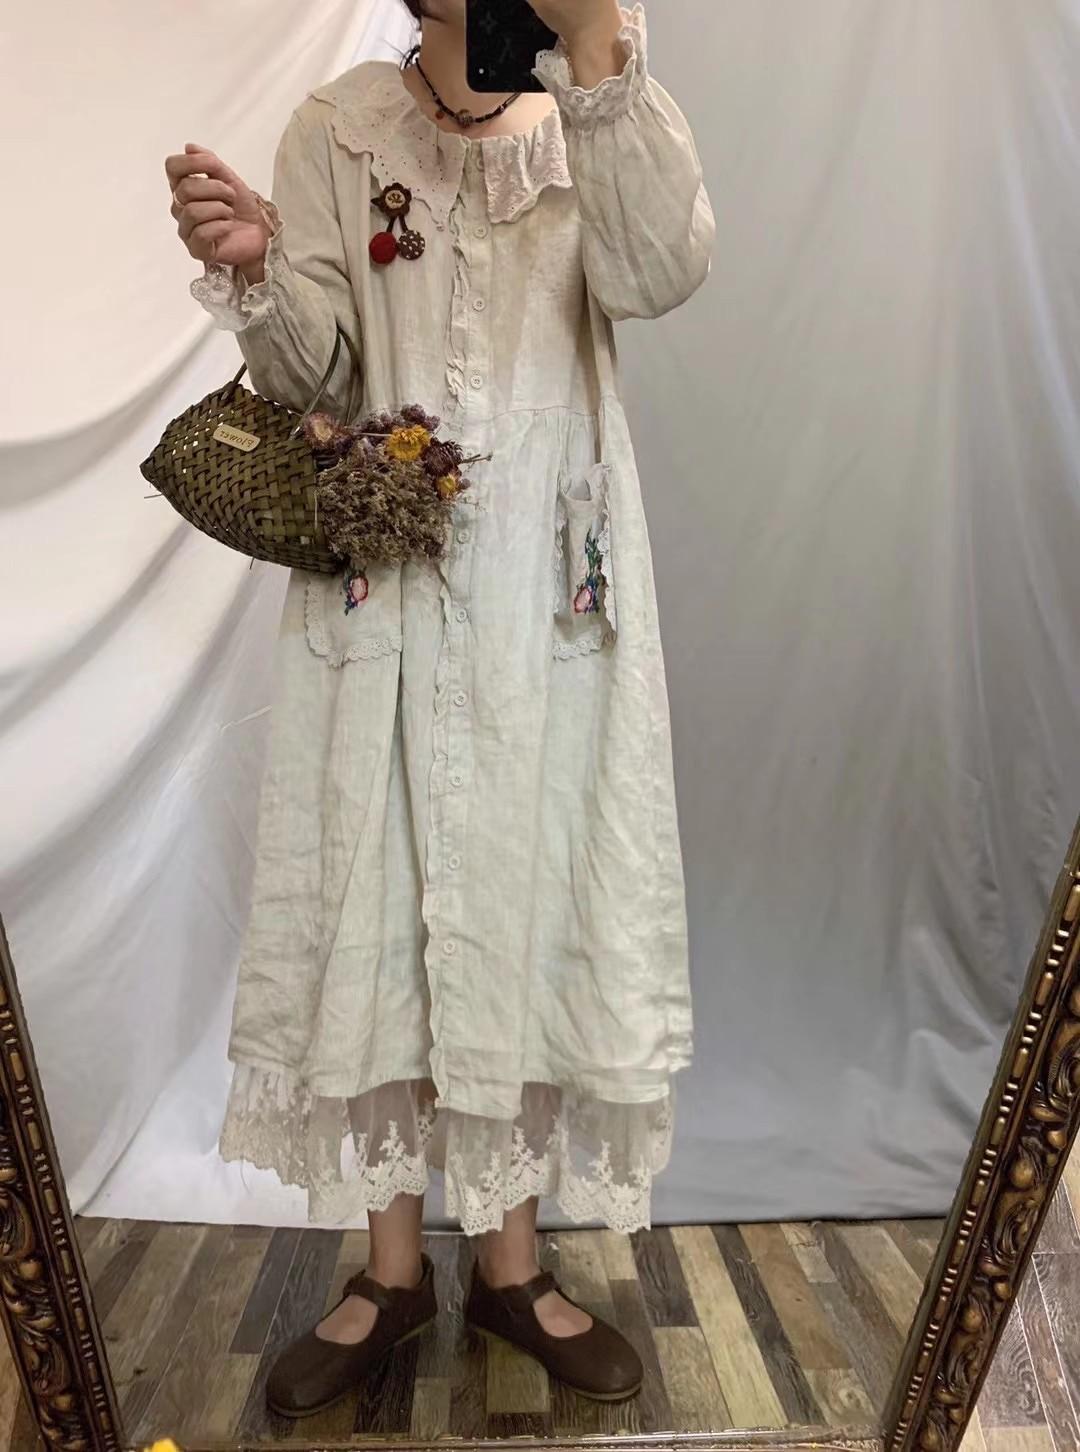 Mori المرأة الحلو التطريز فستان جيوب مزدوجة فضفاضة واحدة الصدر الأميرة فستان من الكتان عادية